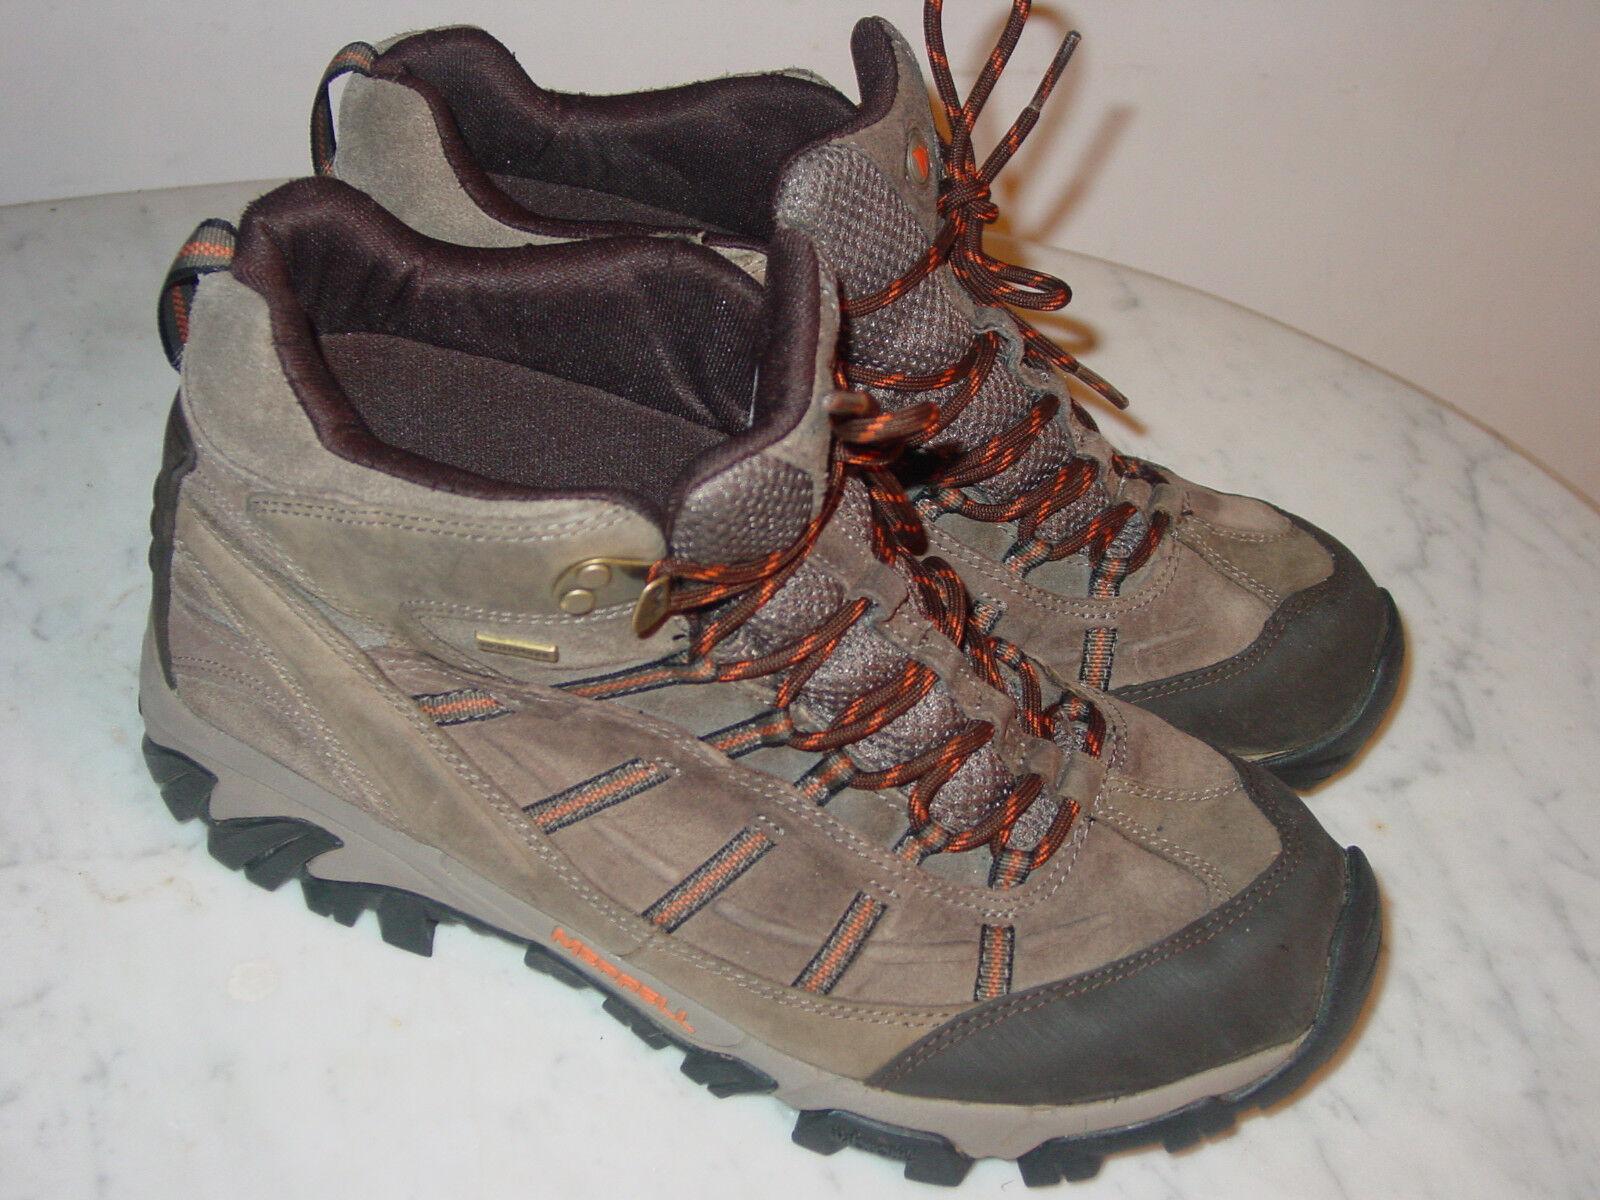 Para Hombre Merrell J39335 Geomorph Blaze botas para excursionismo a prueba de agua Boulder Mid